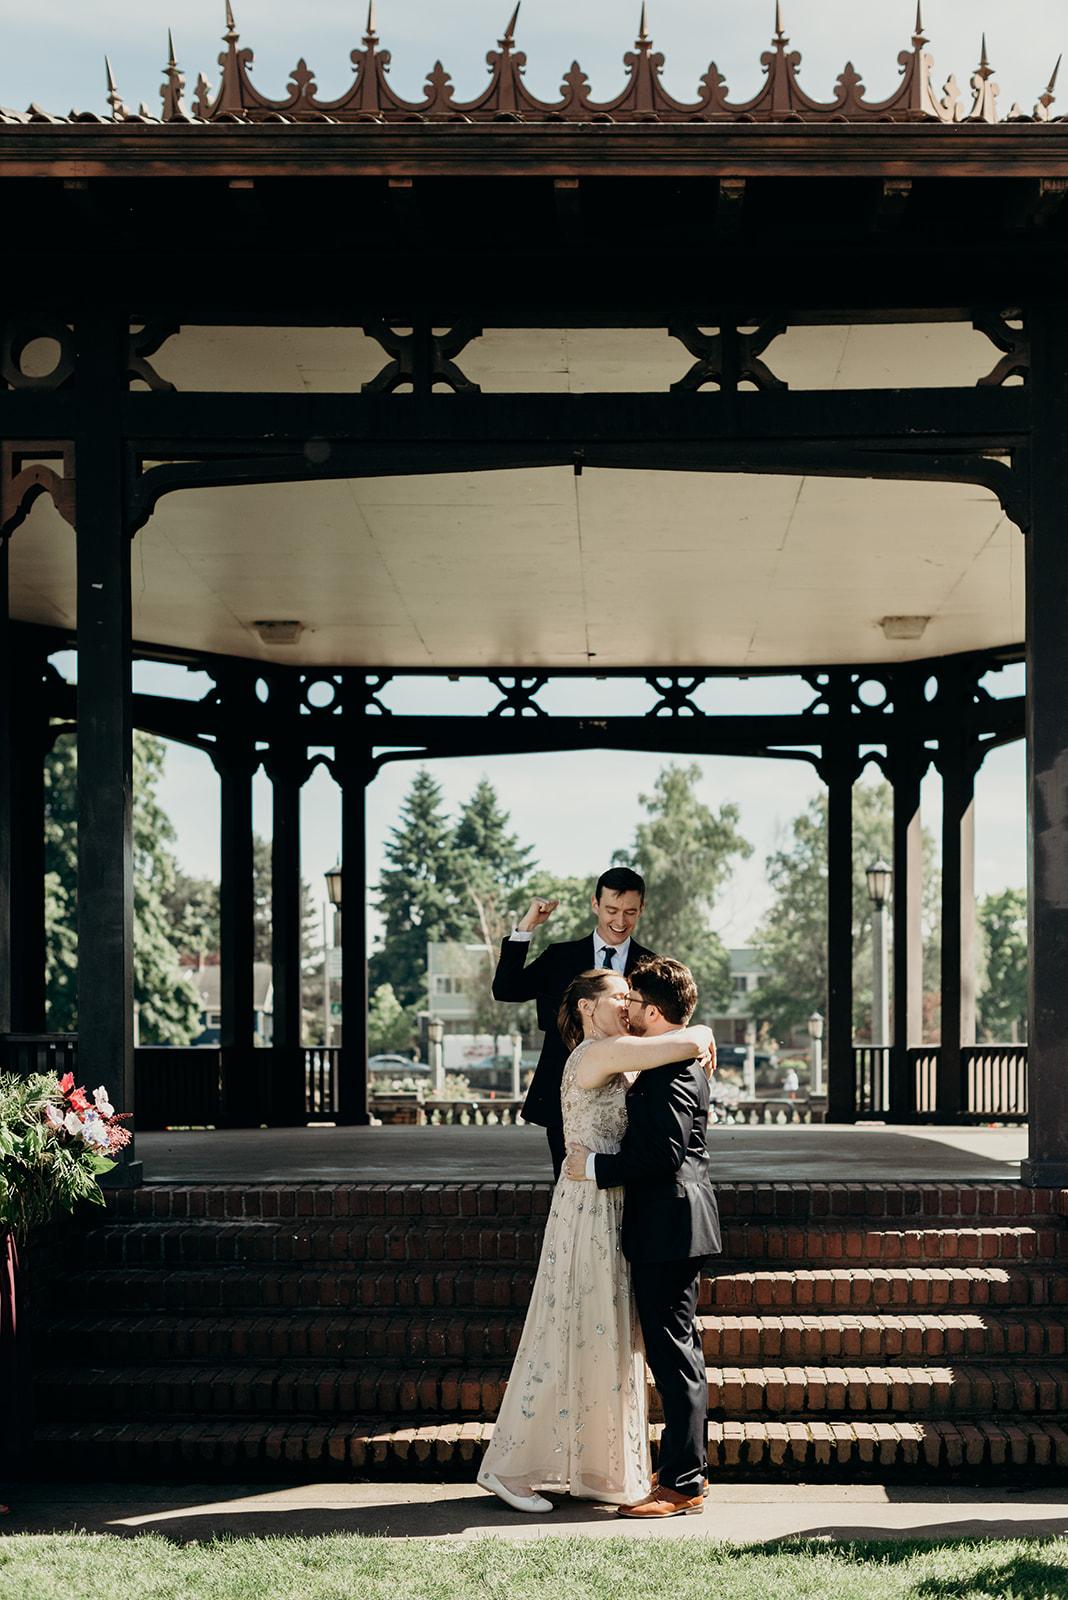 Baker_Building_Wedding_Ryne_Leslie-184.jpg